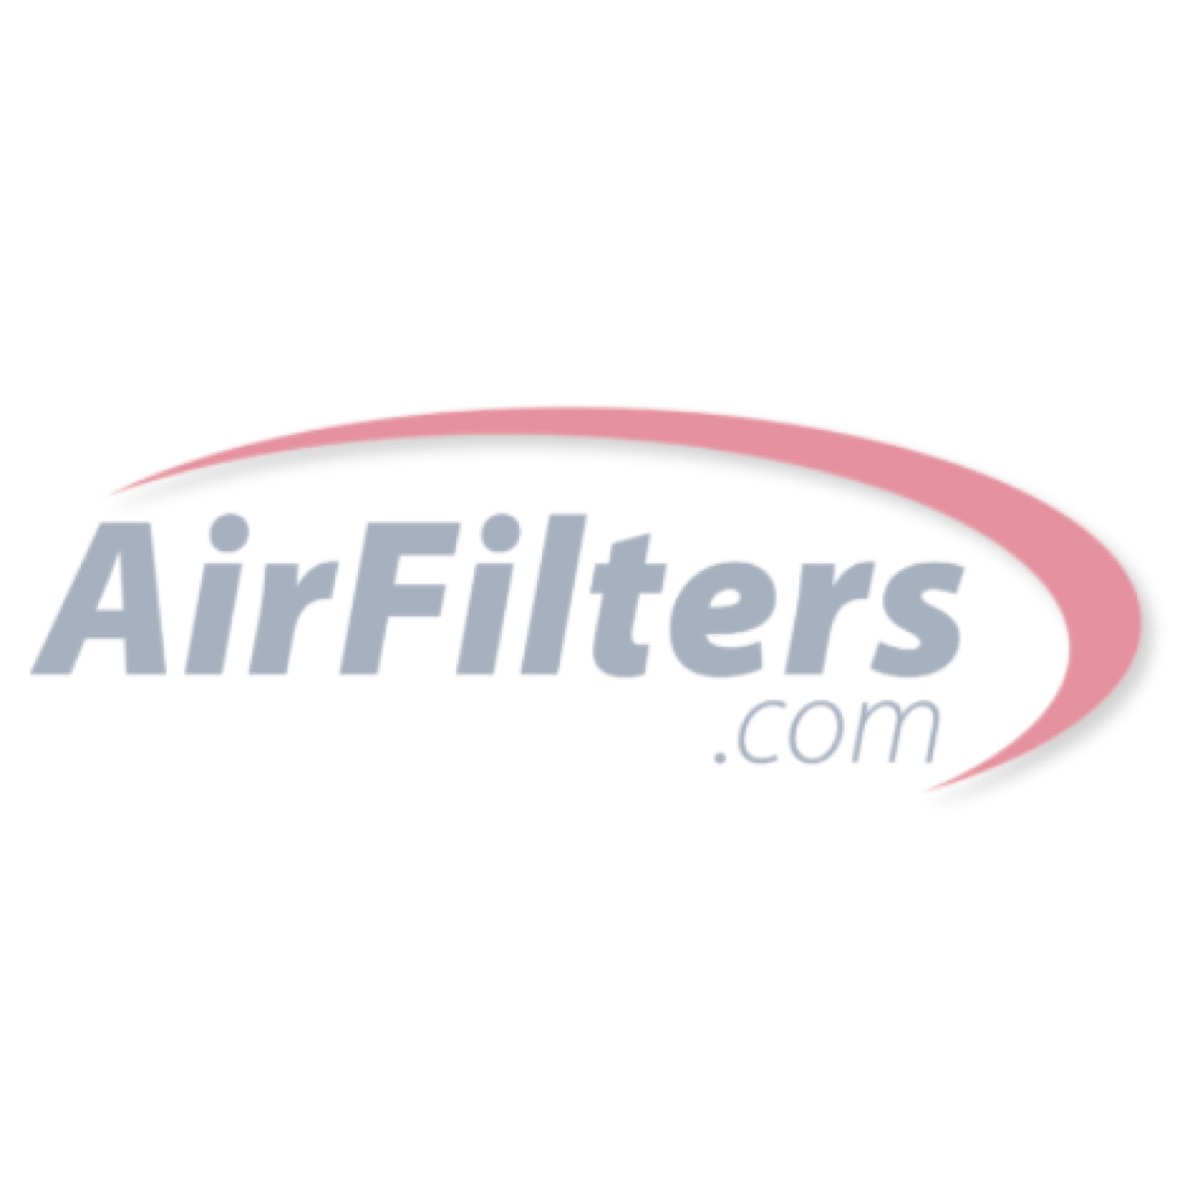 Accumulair Gold MERV 8 Filters - 6 Inch